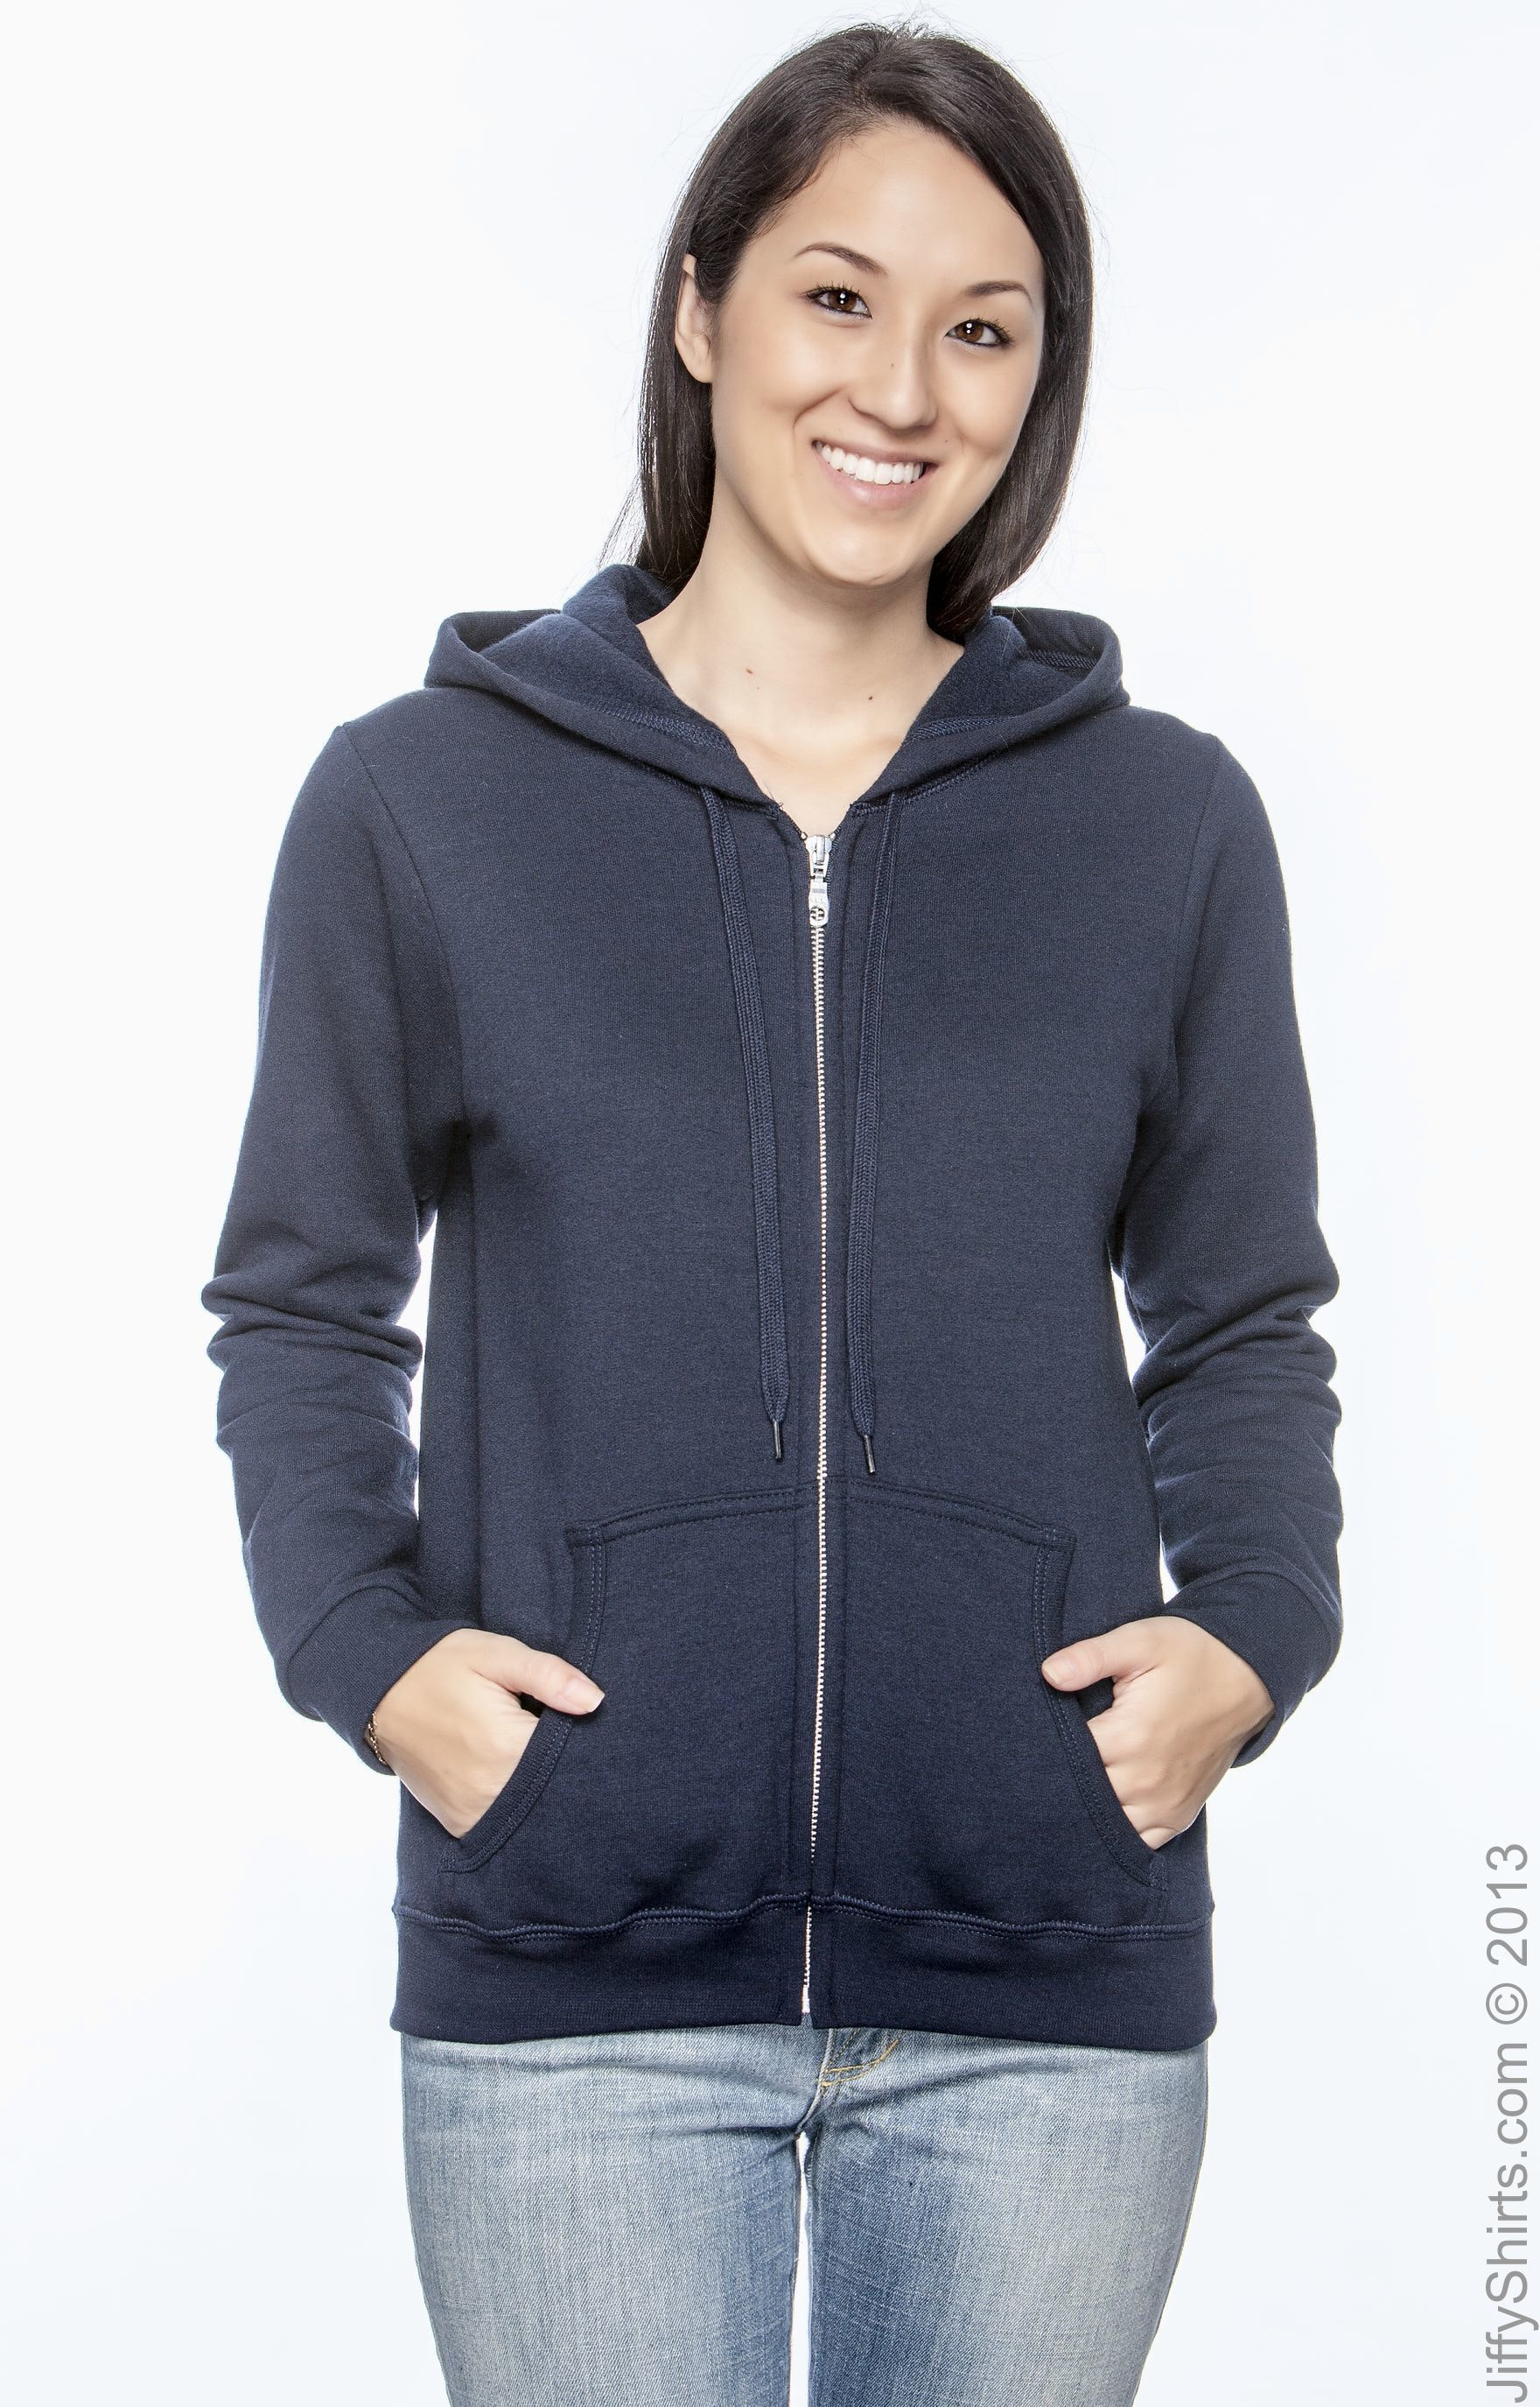 Blank Sweatshirts - JiffyShirts.com